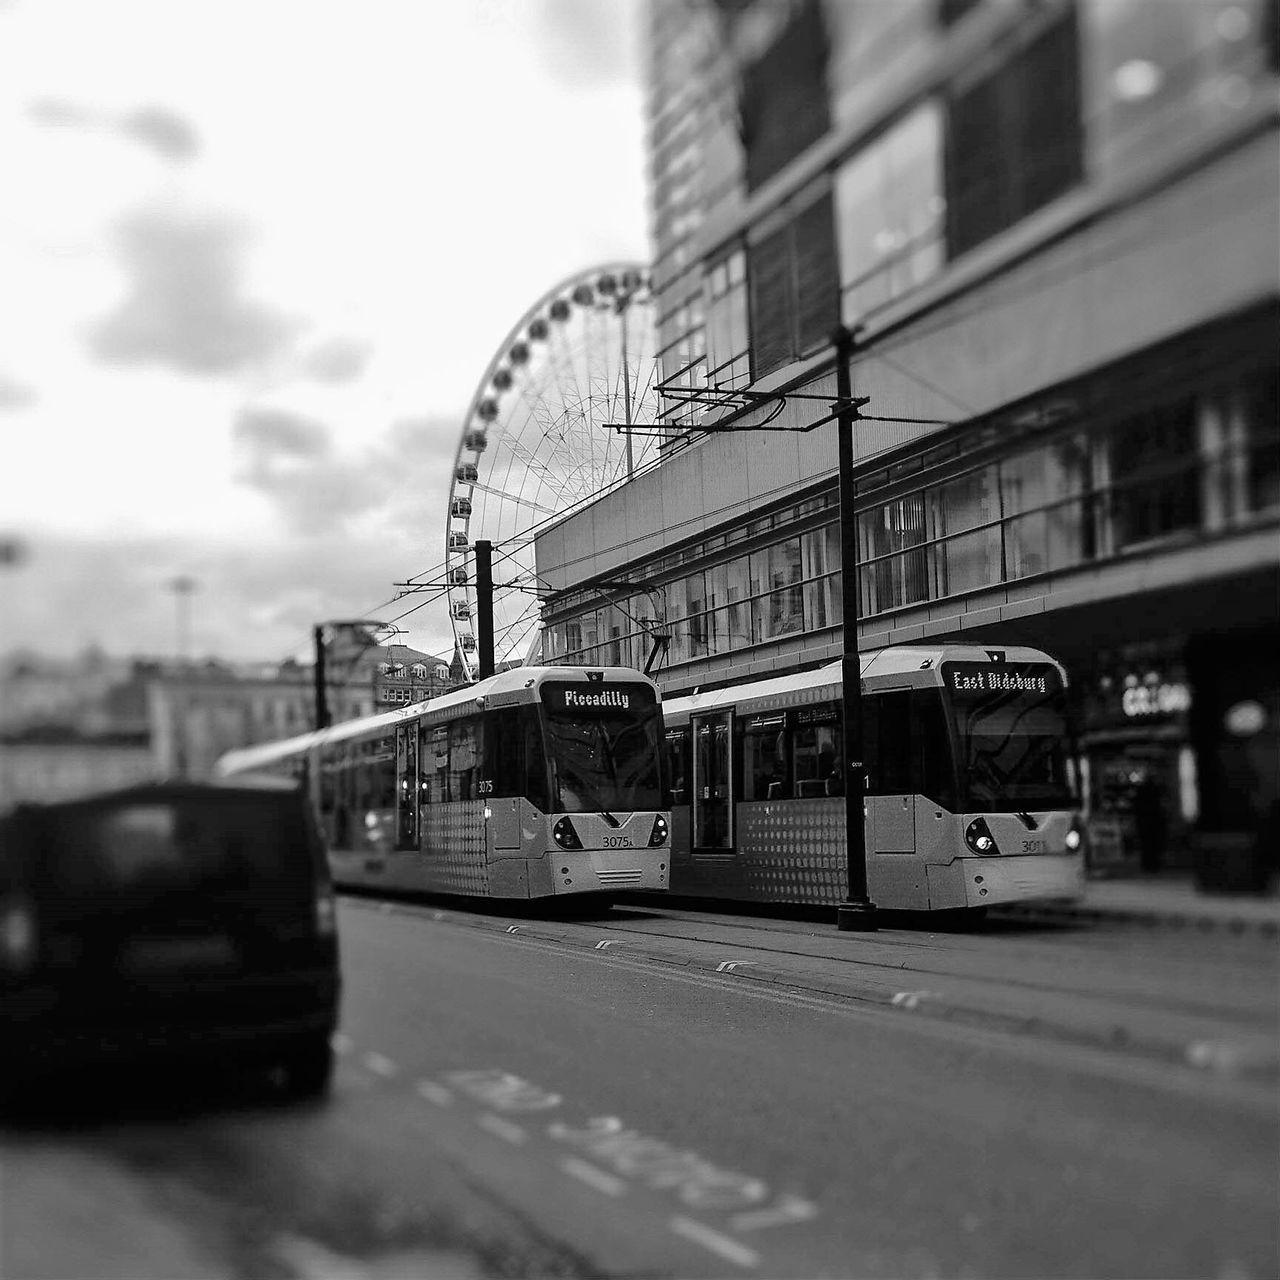 transportation, mode of transport, architecture, built structure, train - vehicle, building exterior, public transportation, land vehicle, sky, day, rail transportation, no people, city, outdoors